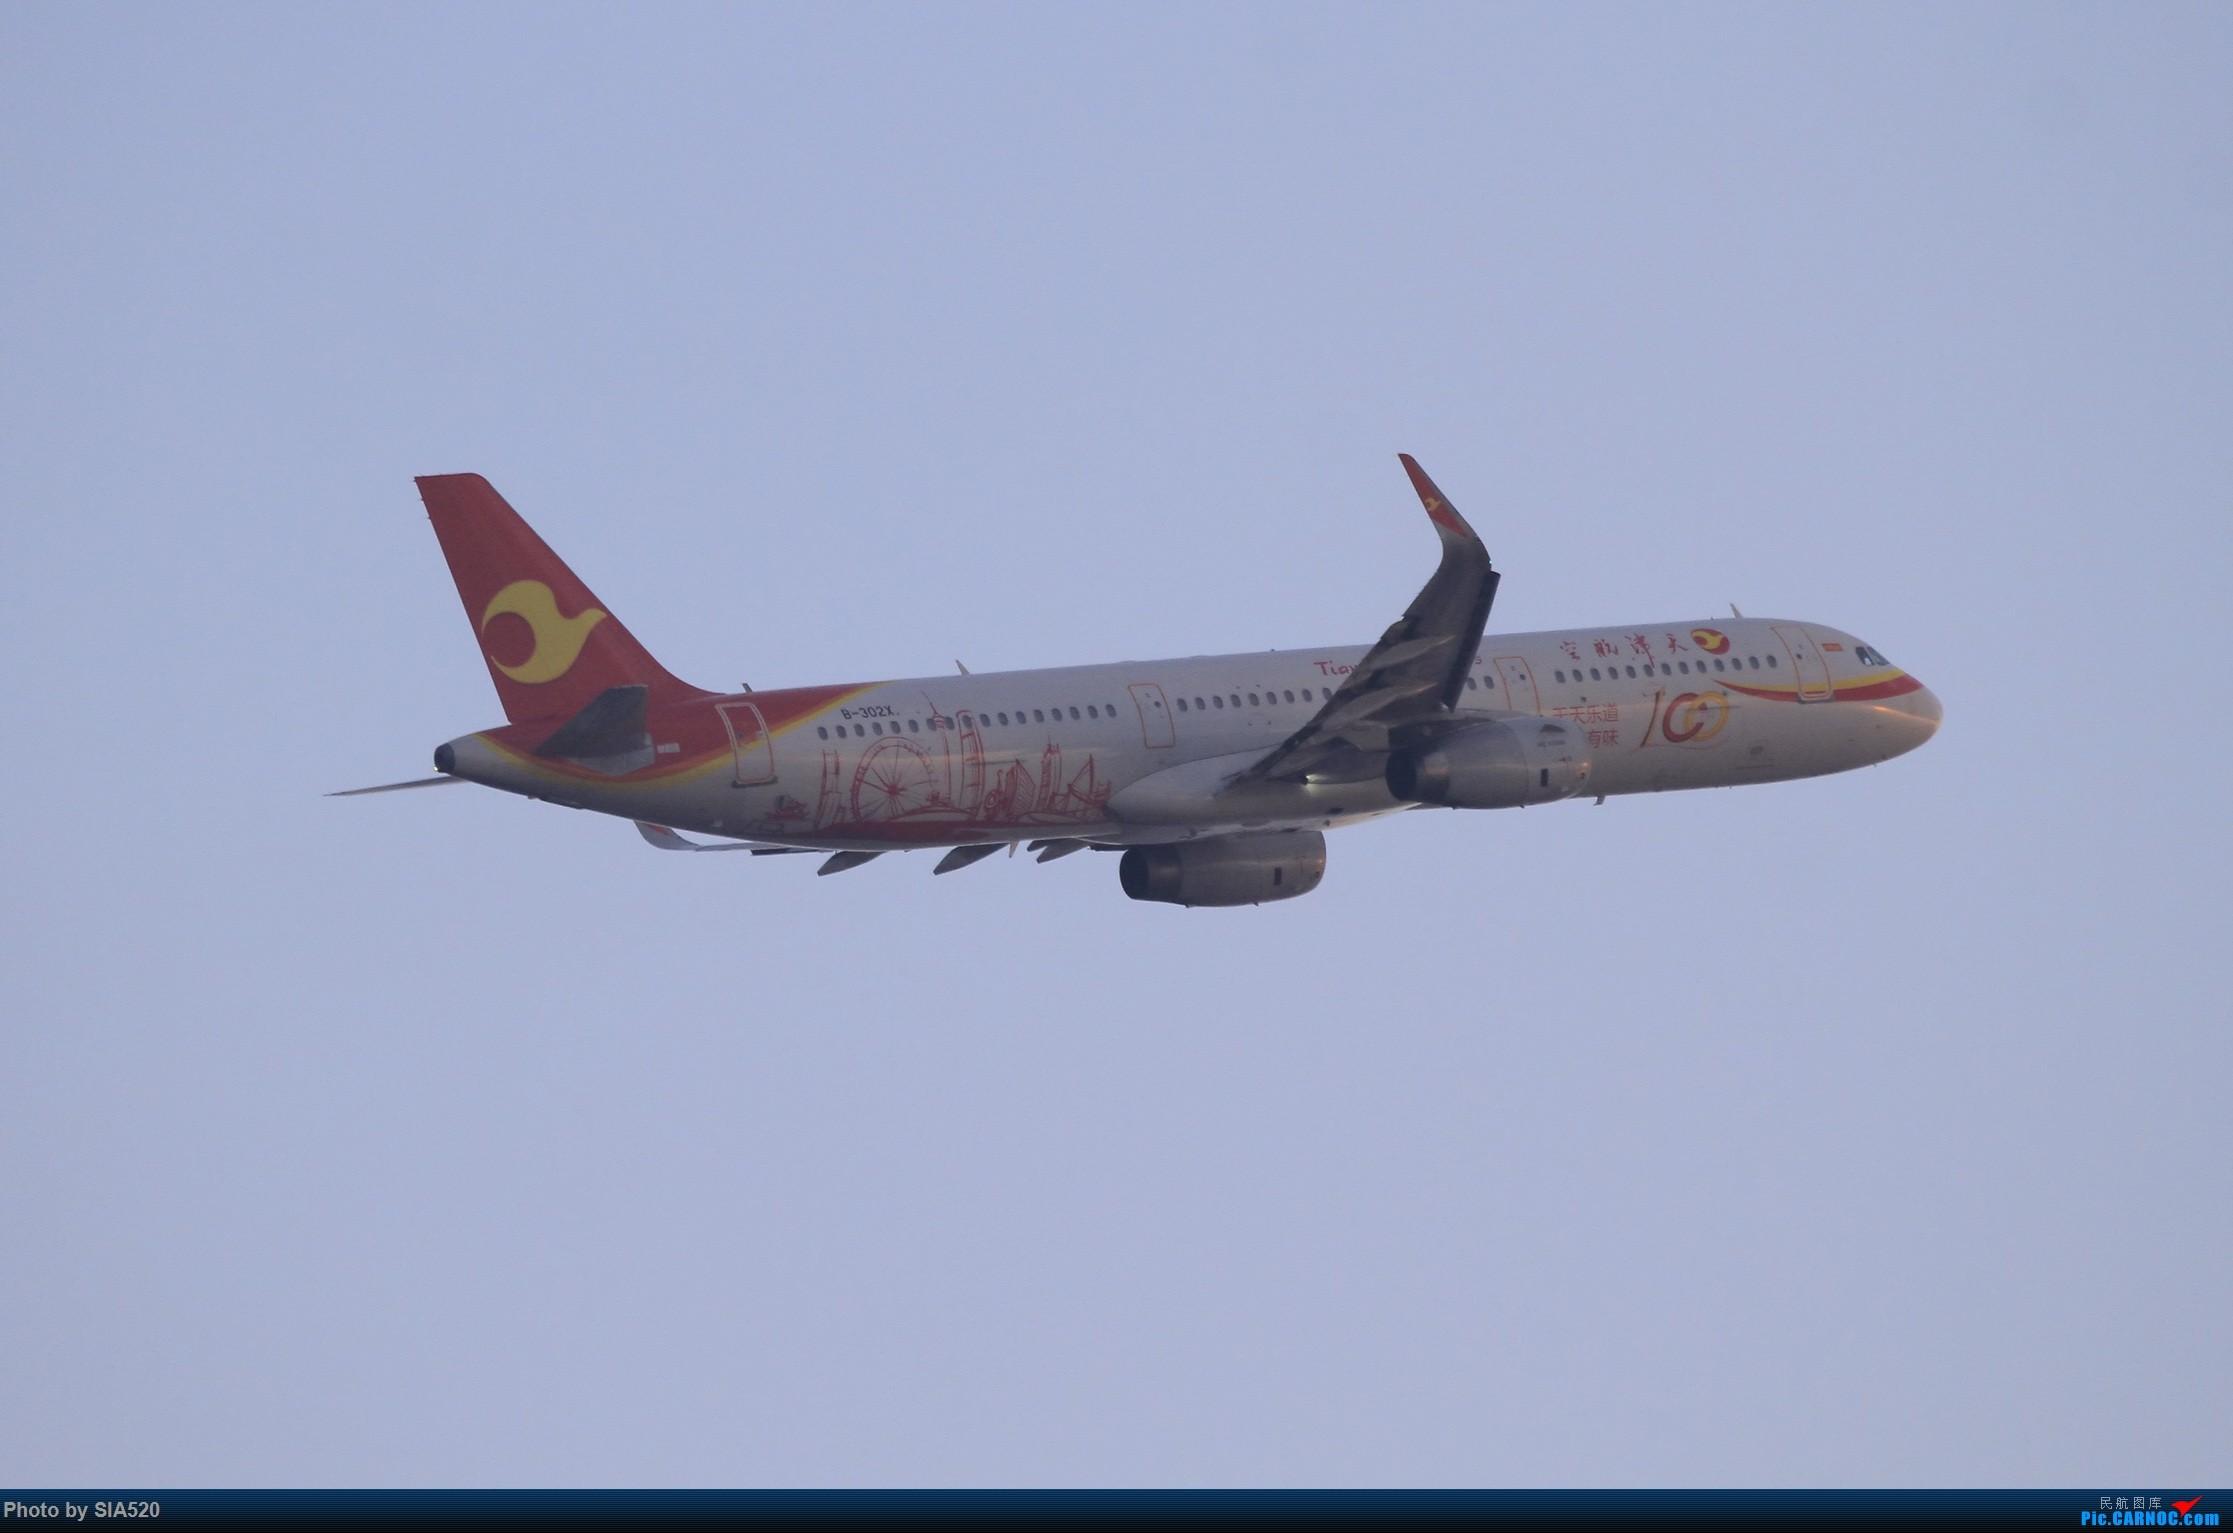 Re:[原创]北京人儿在三亚—600mm解锁凤凰 AIRBUS A321-200 B-302X 中国三亚凤凰国际机场